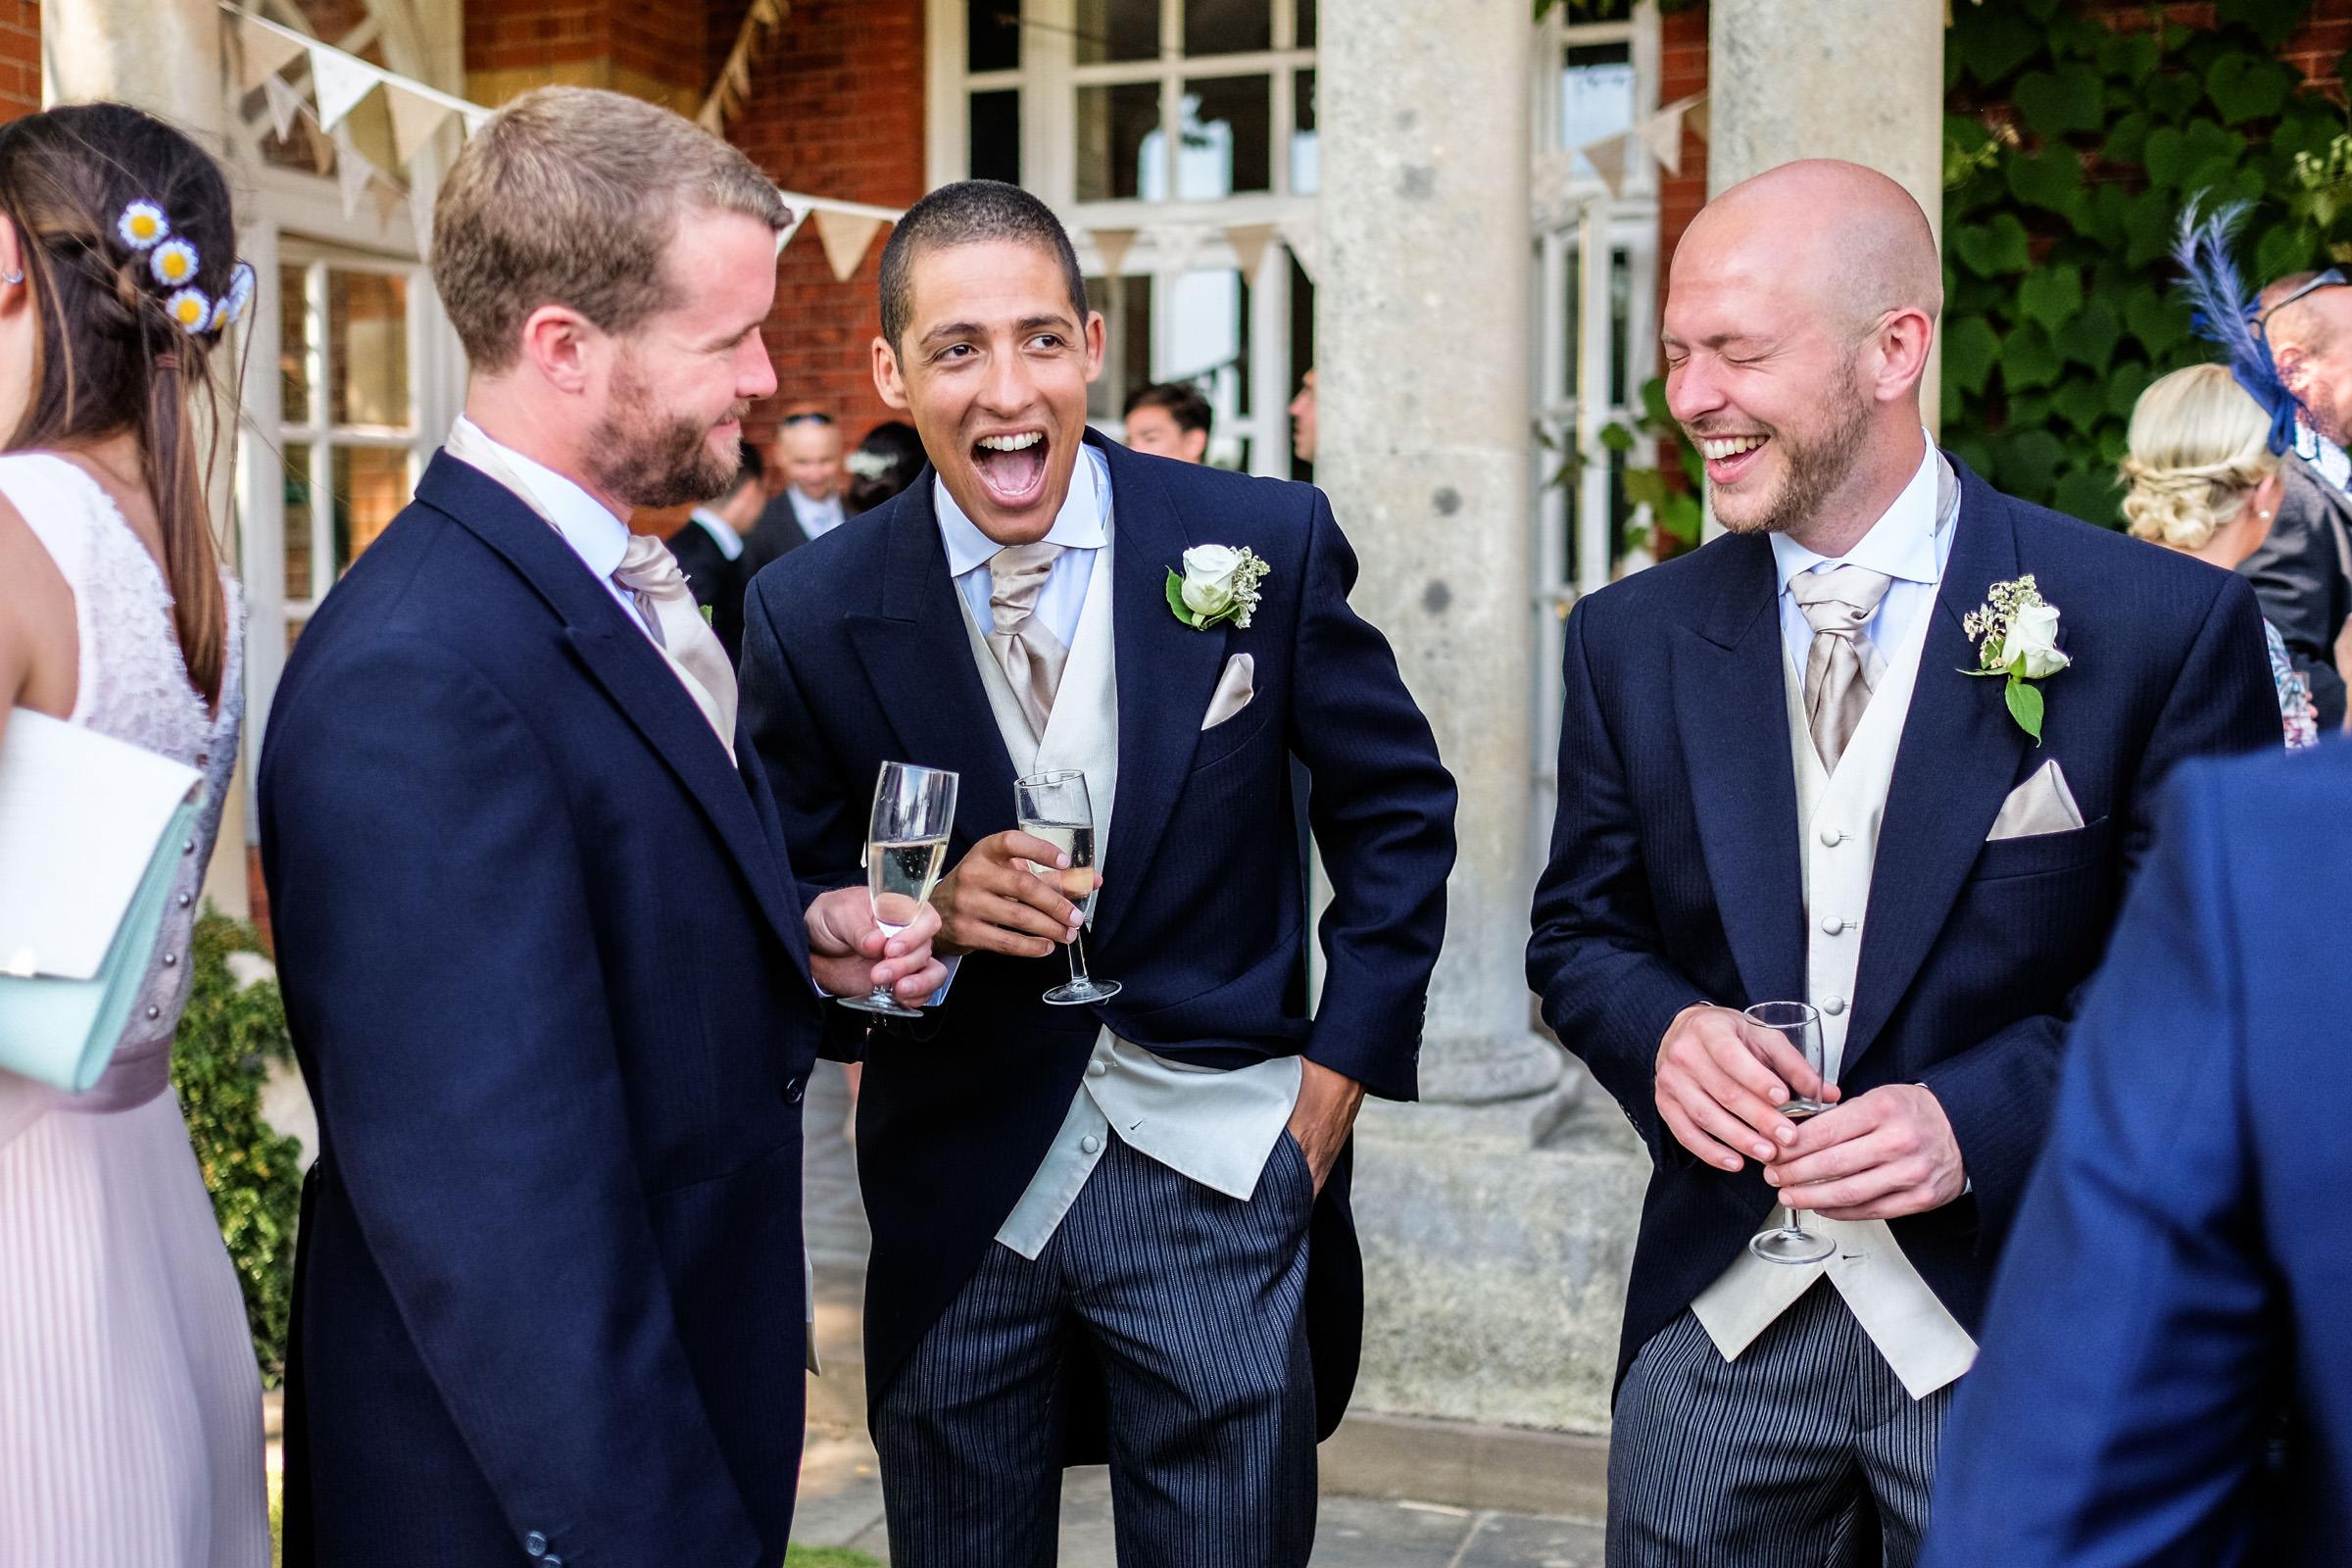 Wedding+at+Parkside+School+in+Surrey+022.jpg